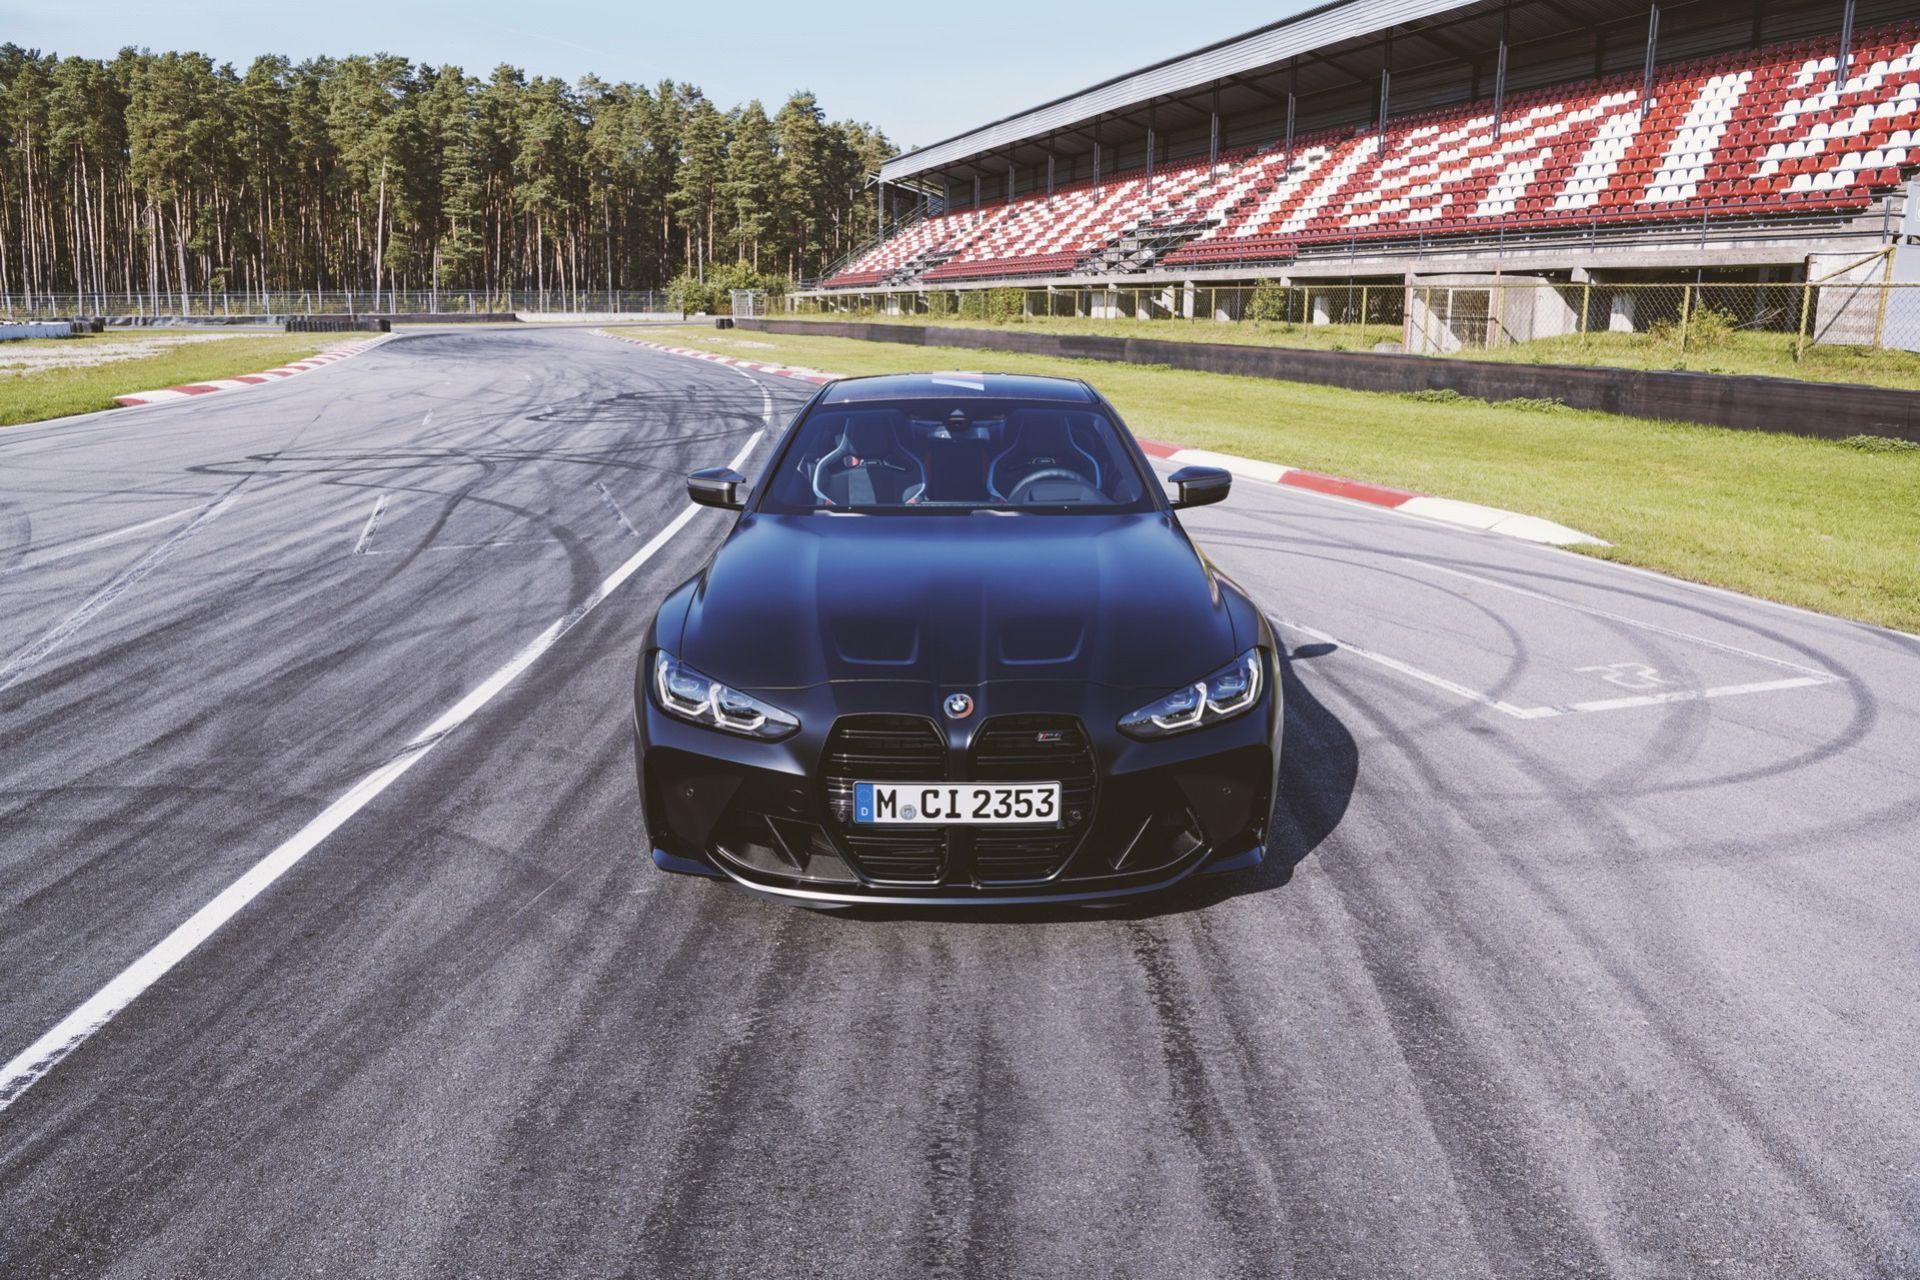 Nya BMW M4 Competition redan som specialversion